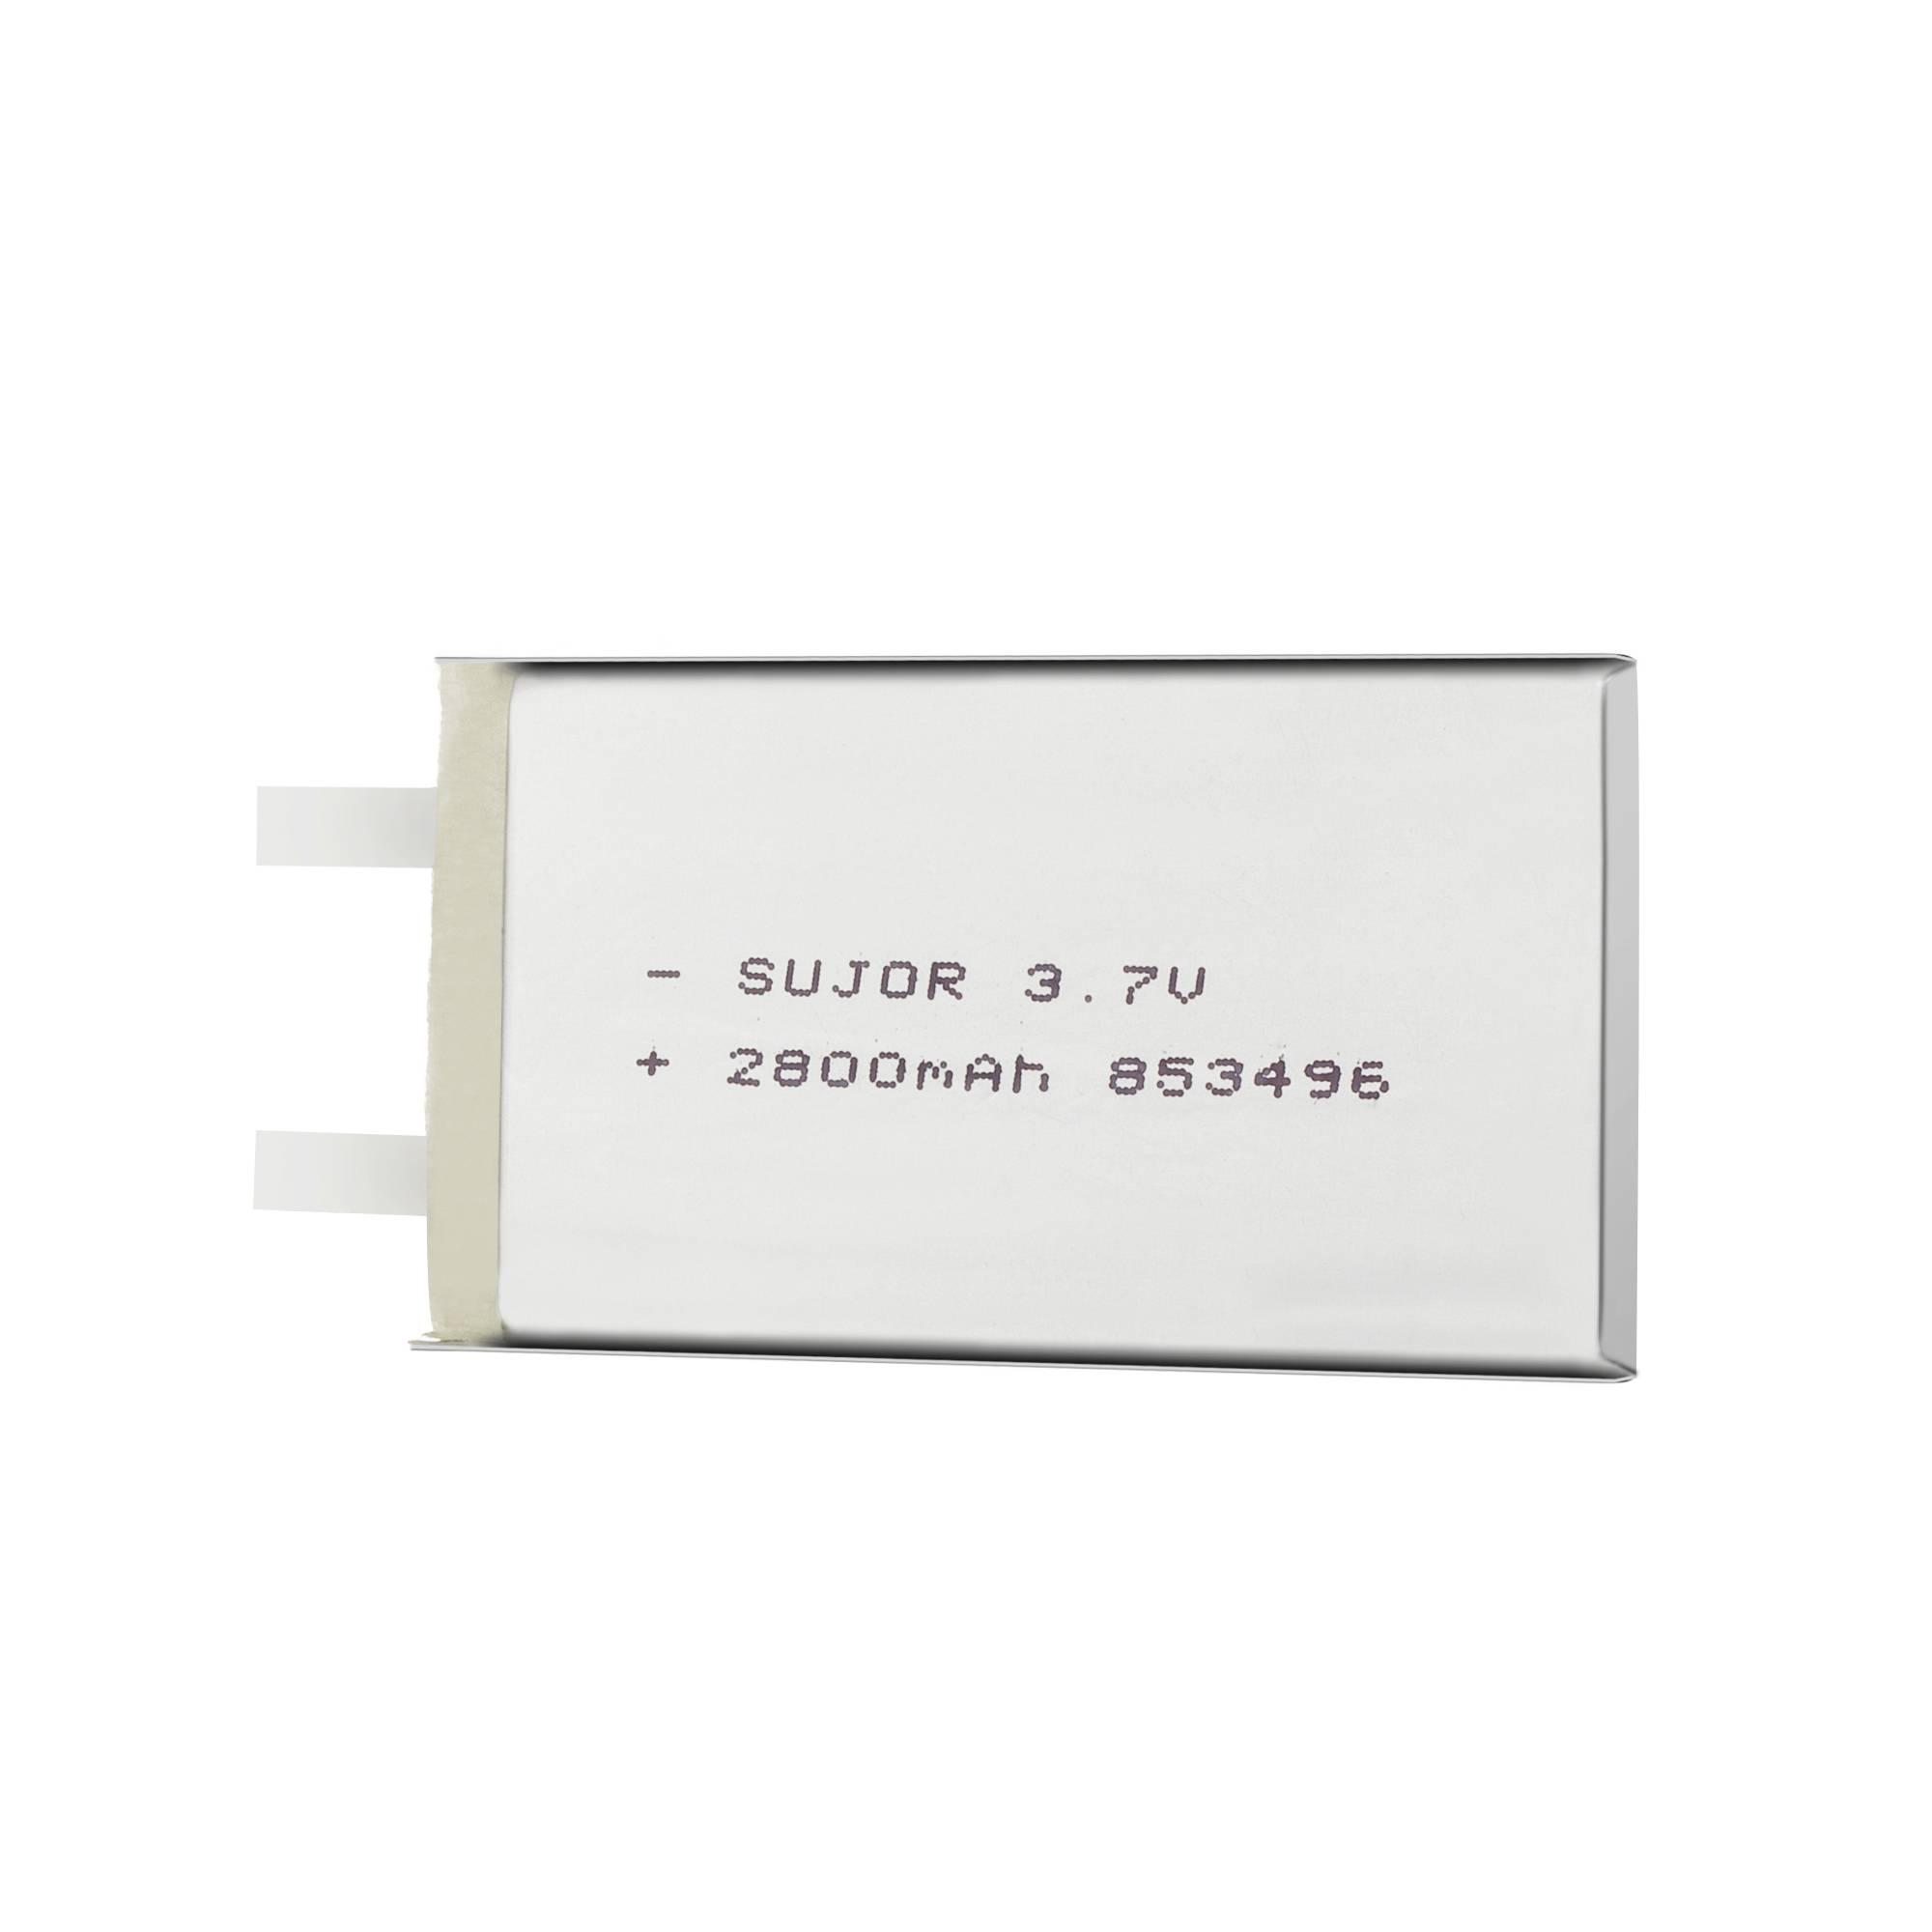 Lithium polymer battery for medical product 3.7V PL853496